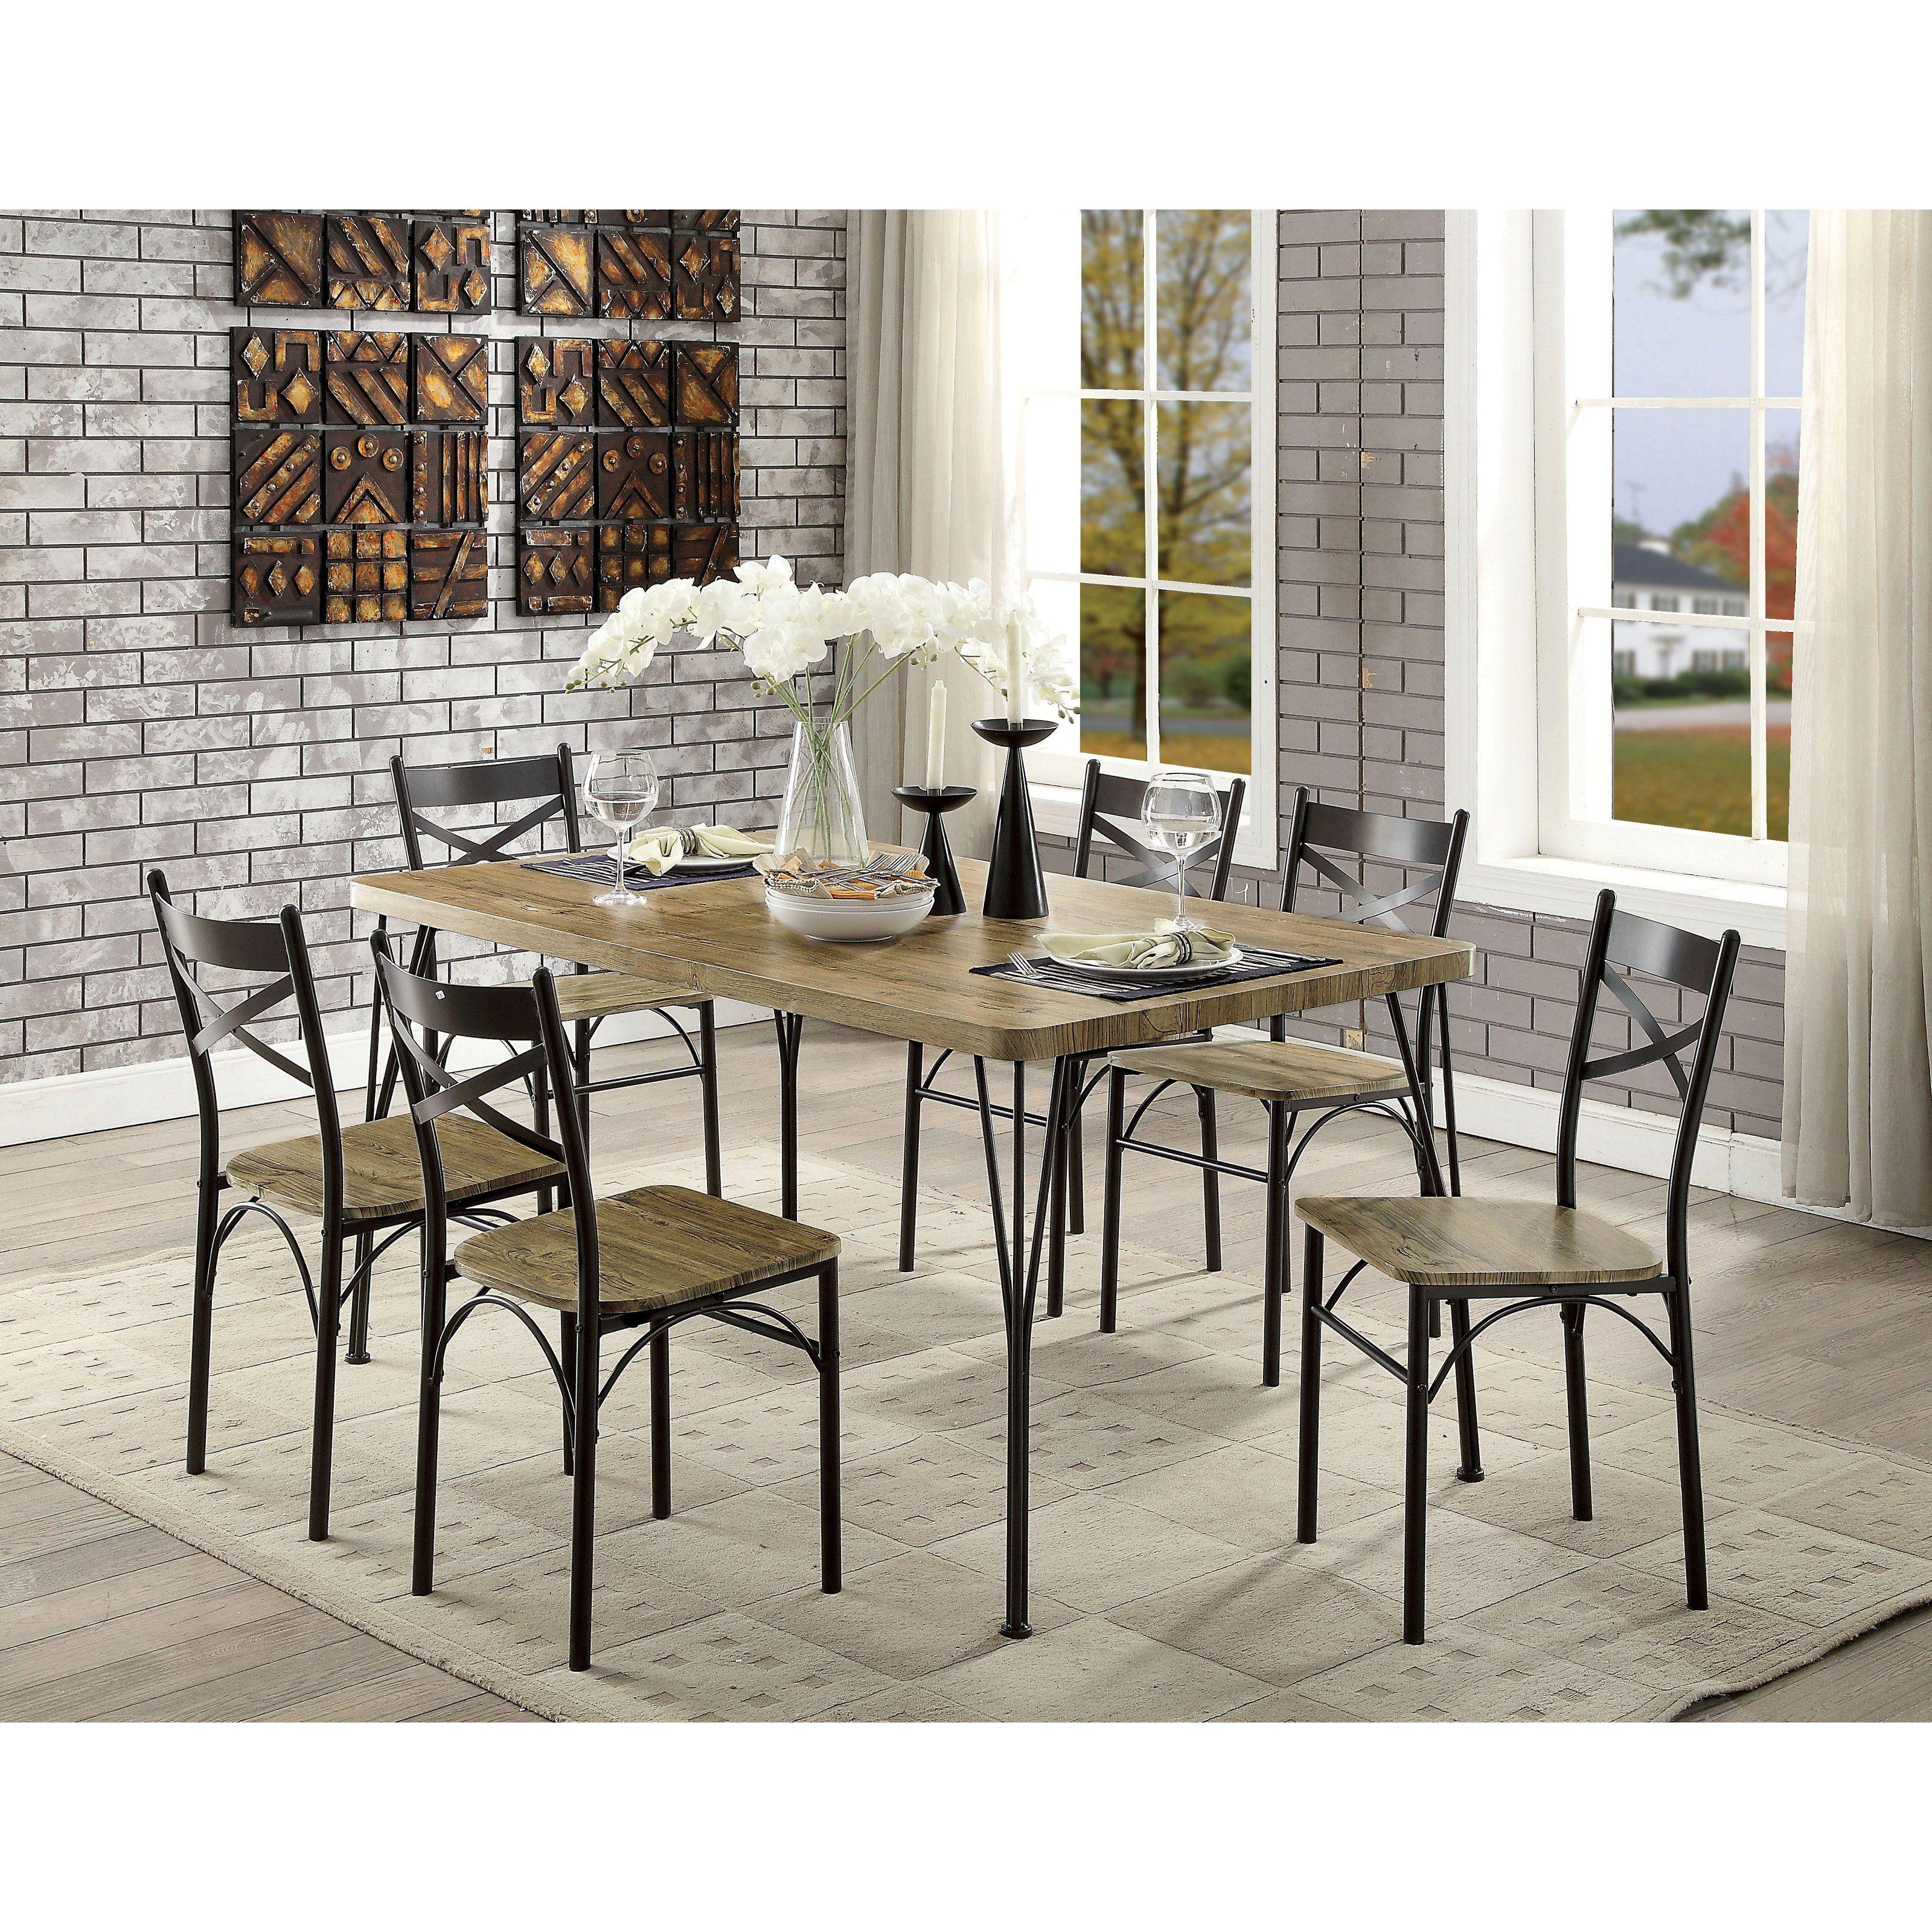 furniture of america milland 7 piece industrial farmhouse dining rh pinterest com